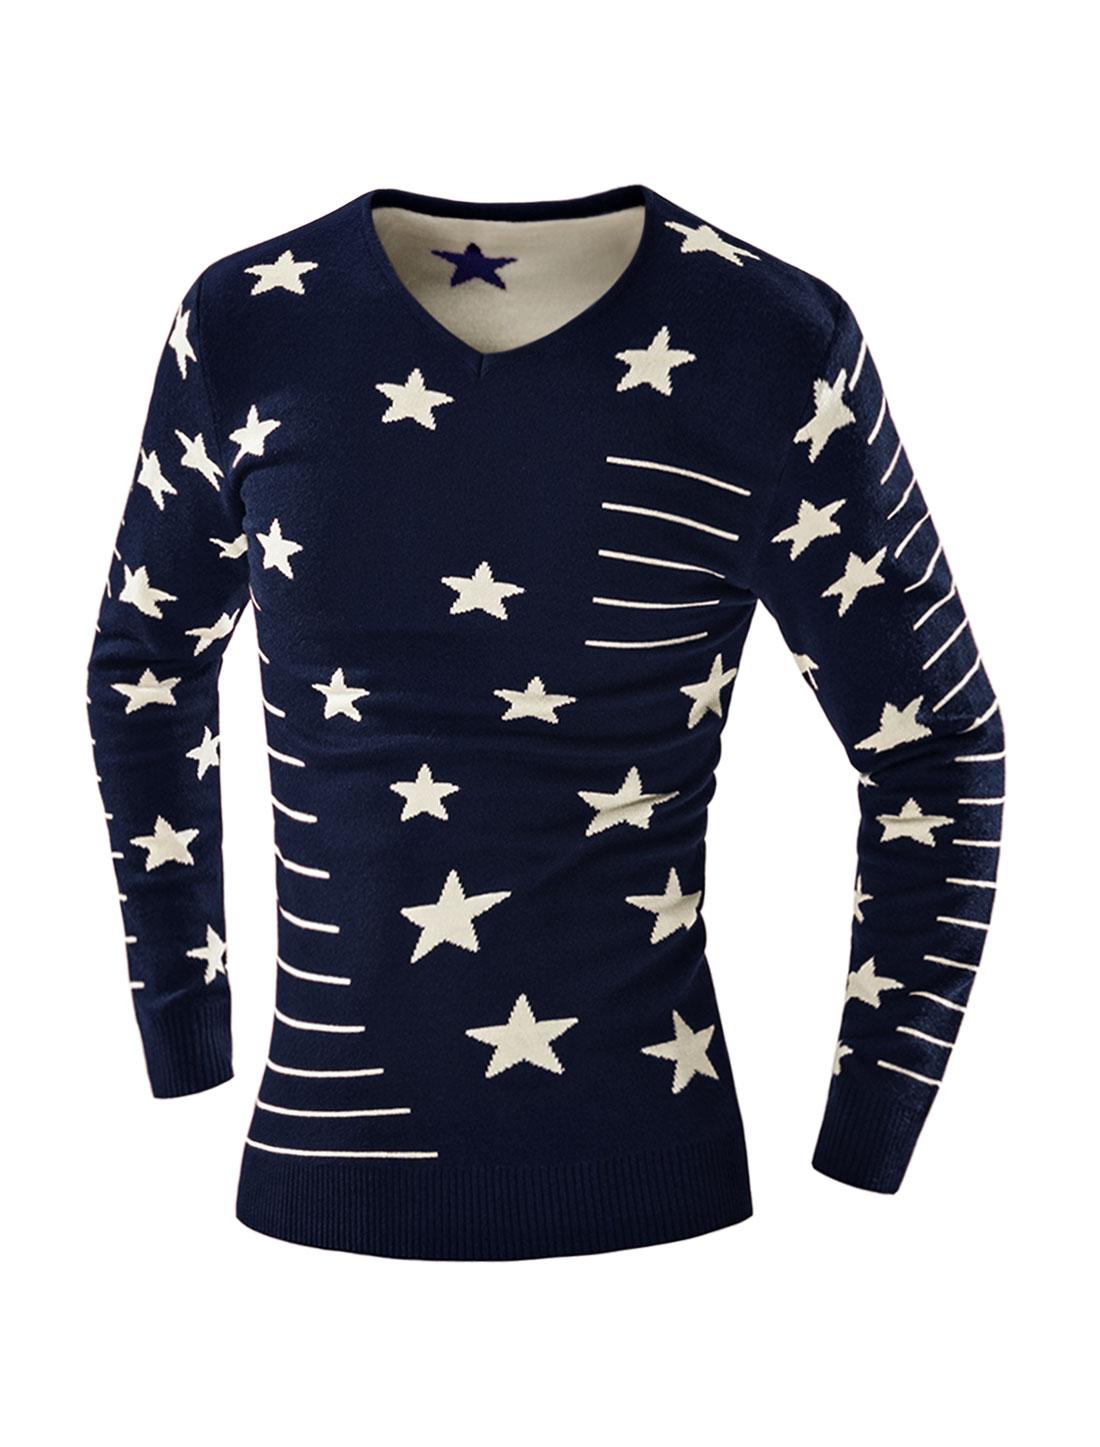 Man V Neck Slim Fit Striped Stars Knit Shirt Blue M